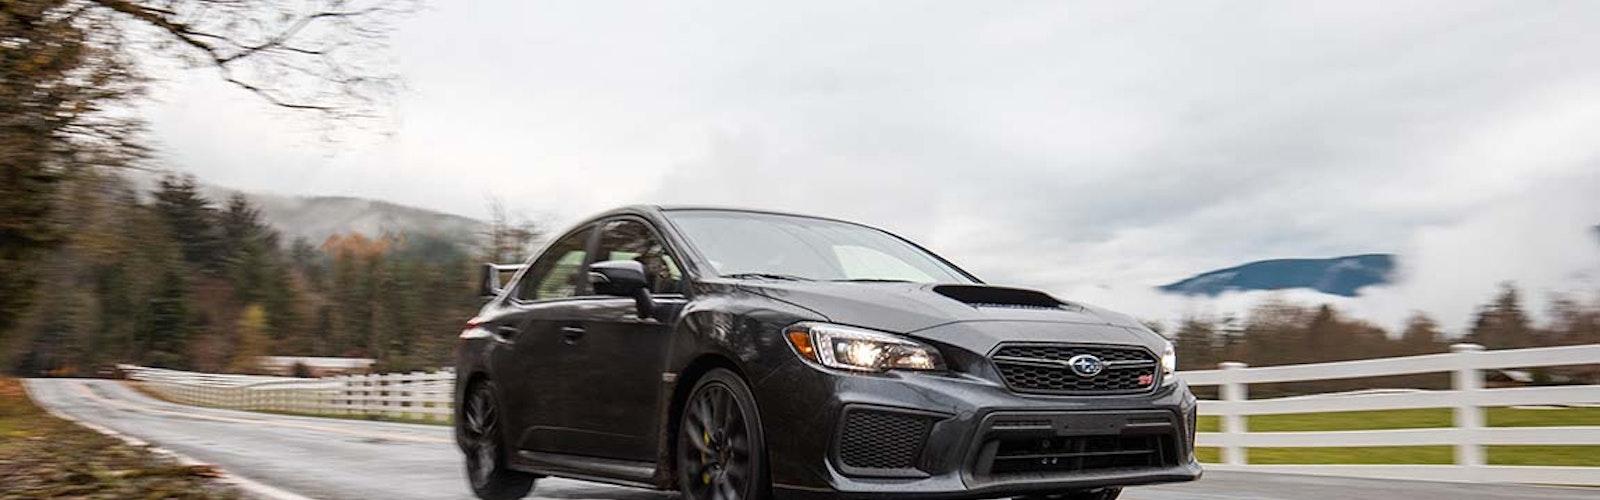 Subaru-Wet-Road